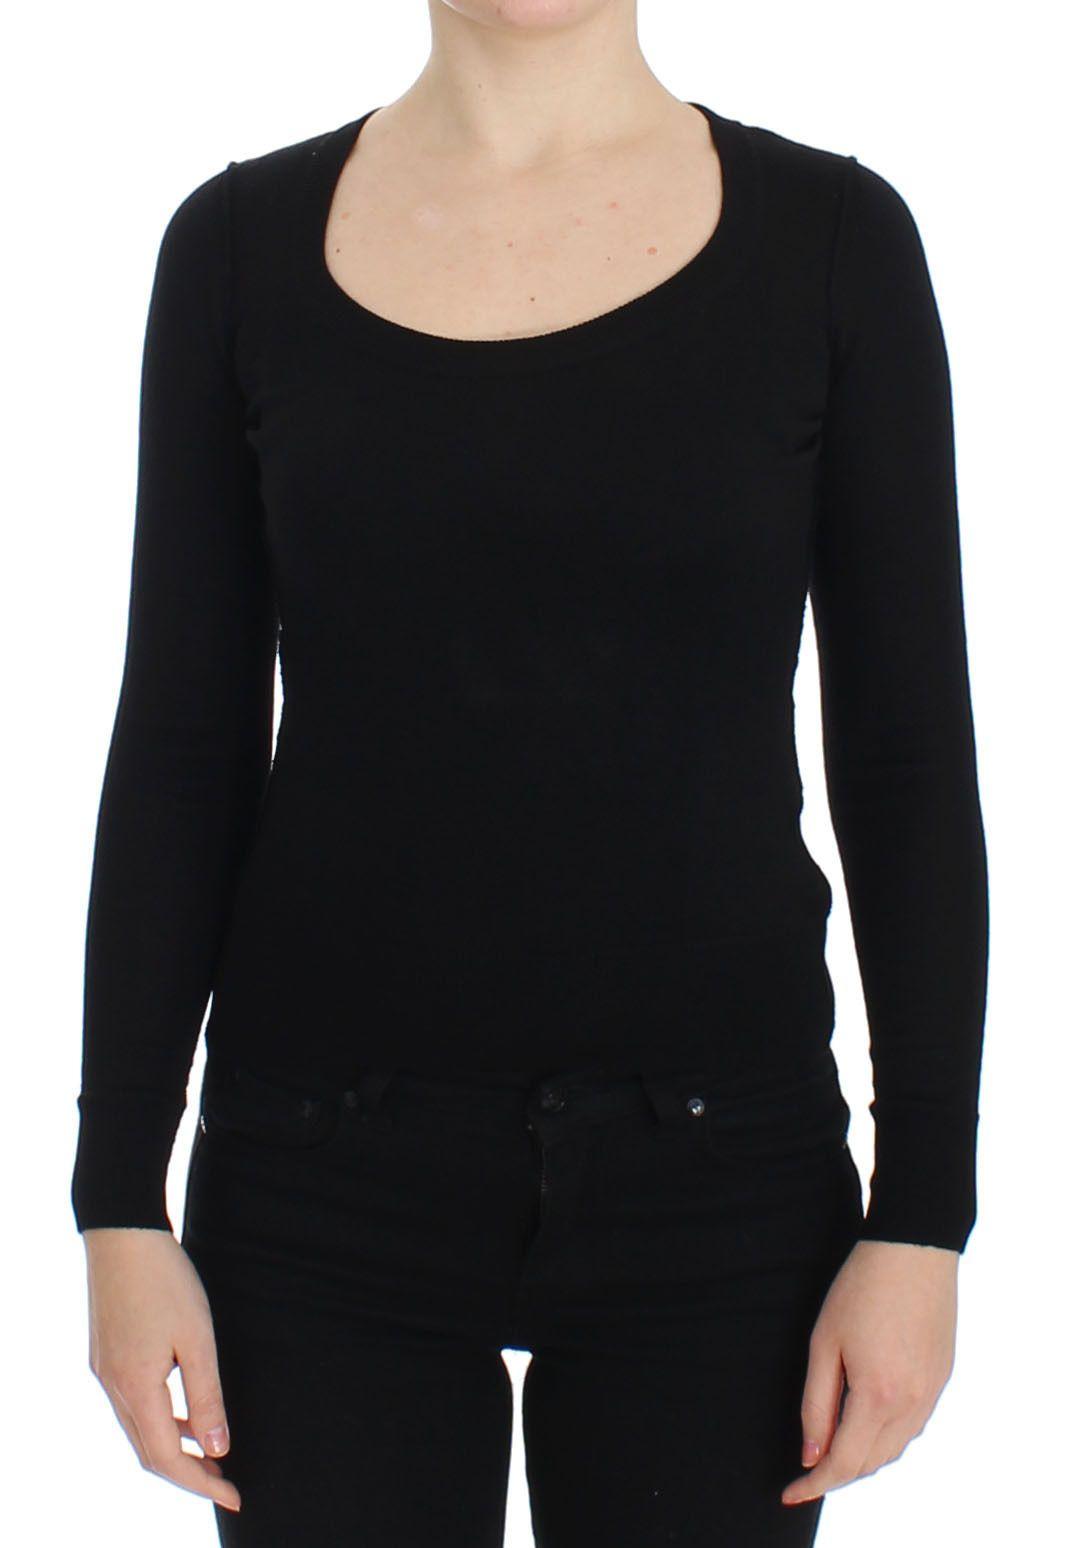 Dolce & Gabbana Women's Wool Crewneck Pullover Sweater Black SIG13361 - IT38|XS